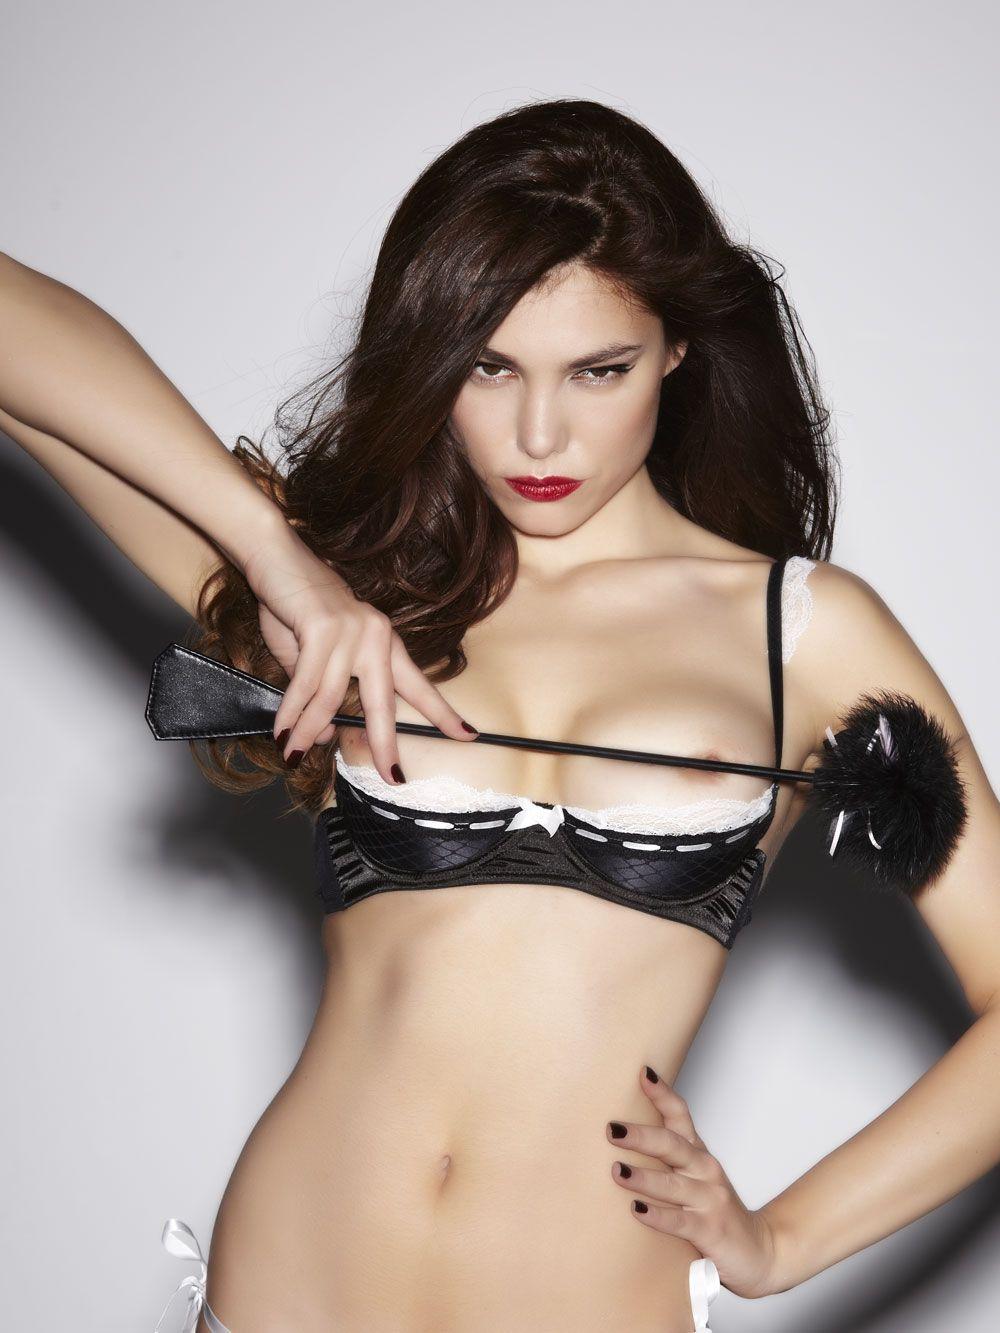 Ann summers womens amore halter bra nudeblack sexy lingerie underwear l on onbuy